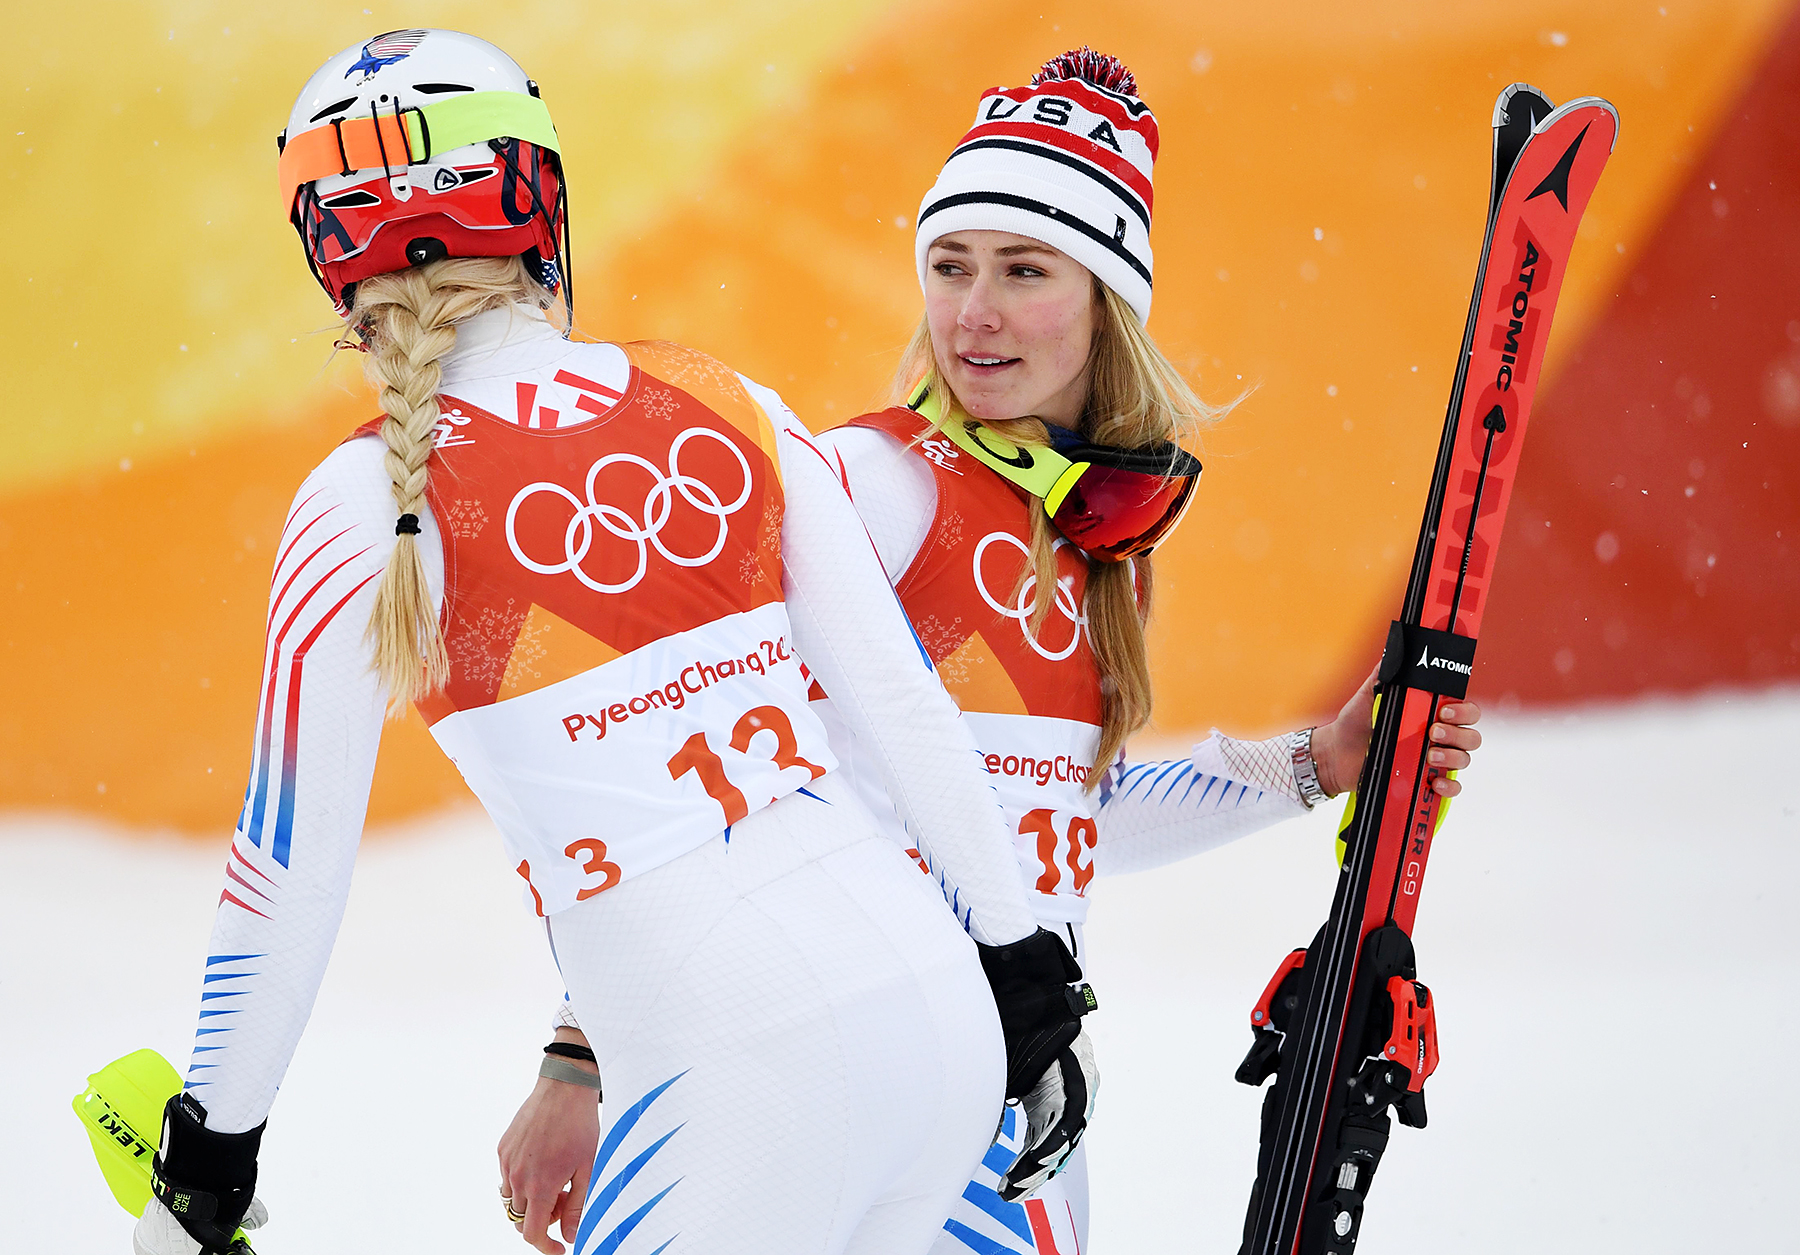 Lindsey Vonn Mikaela Shiffrin Pyeongchang 2018 Winter Olympics